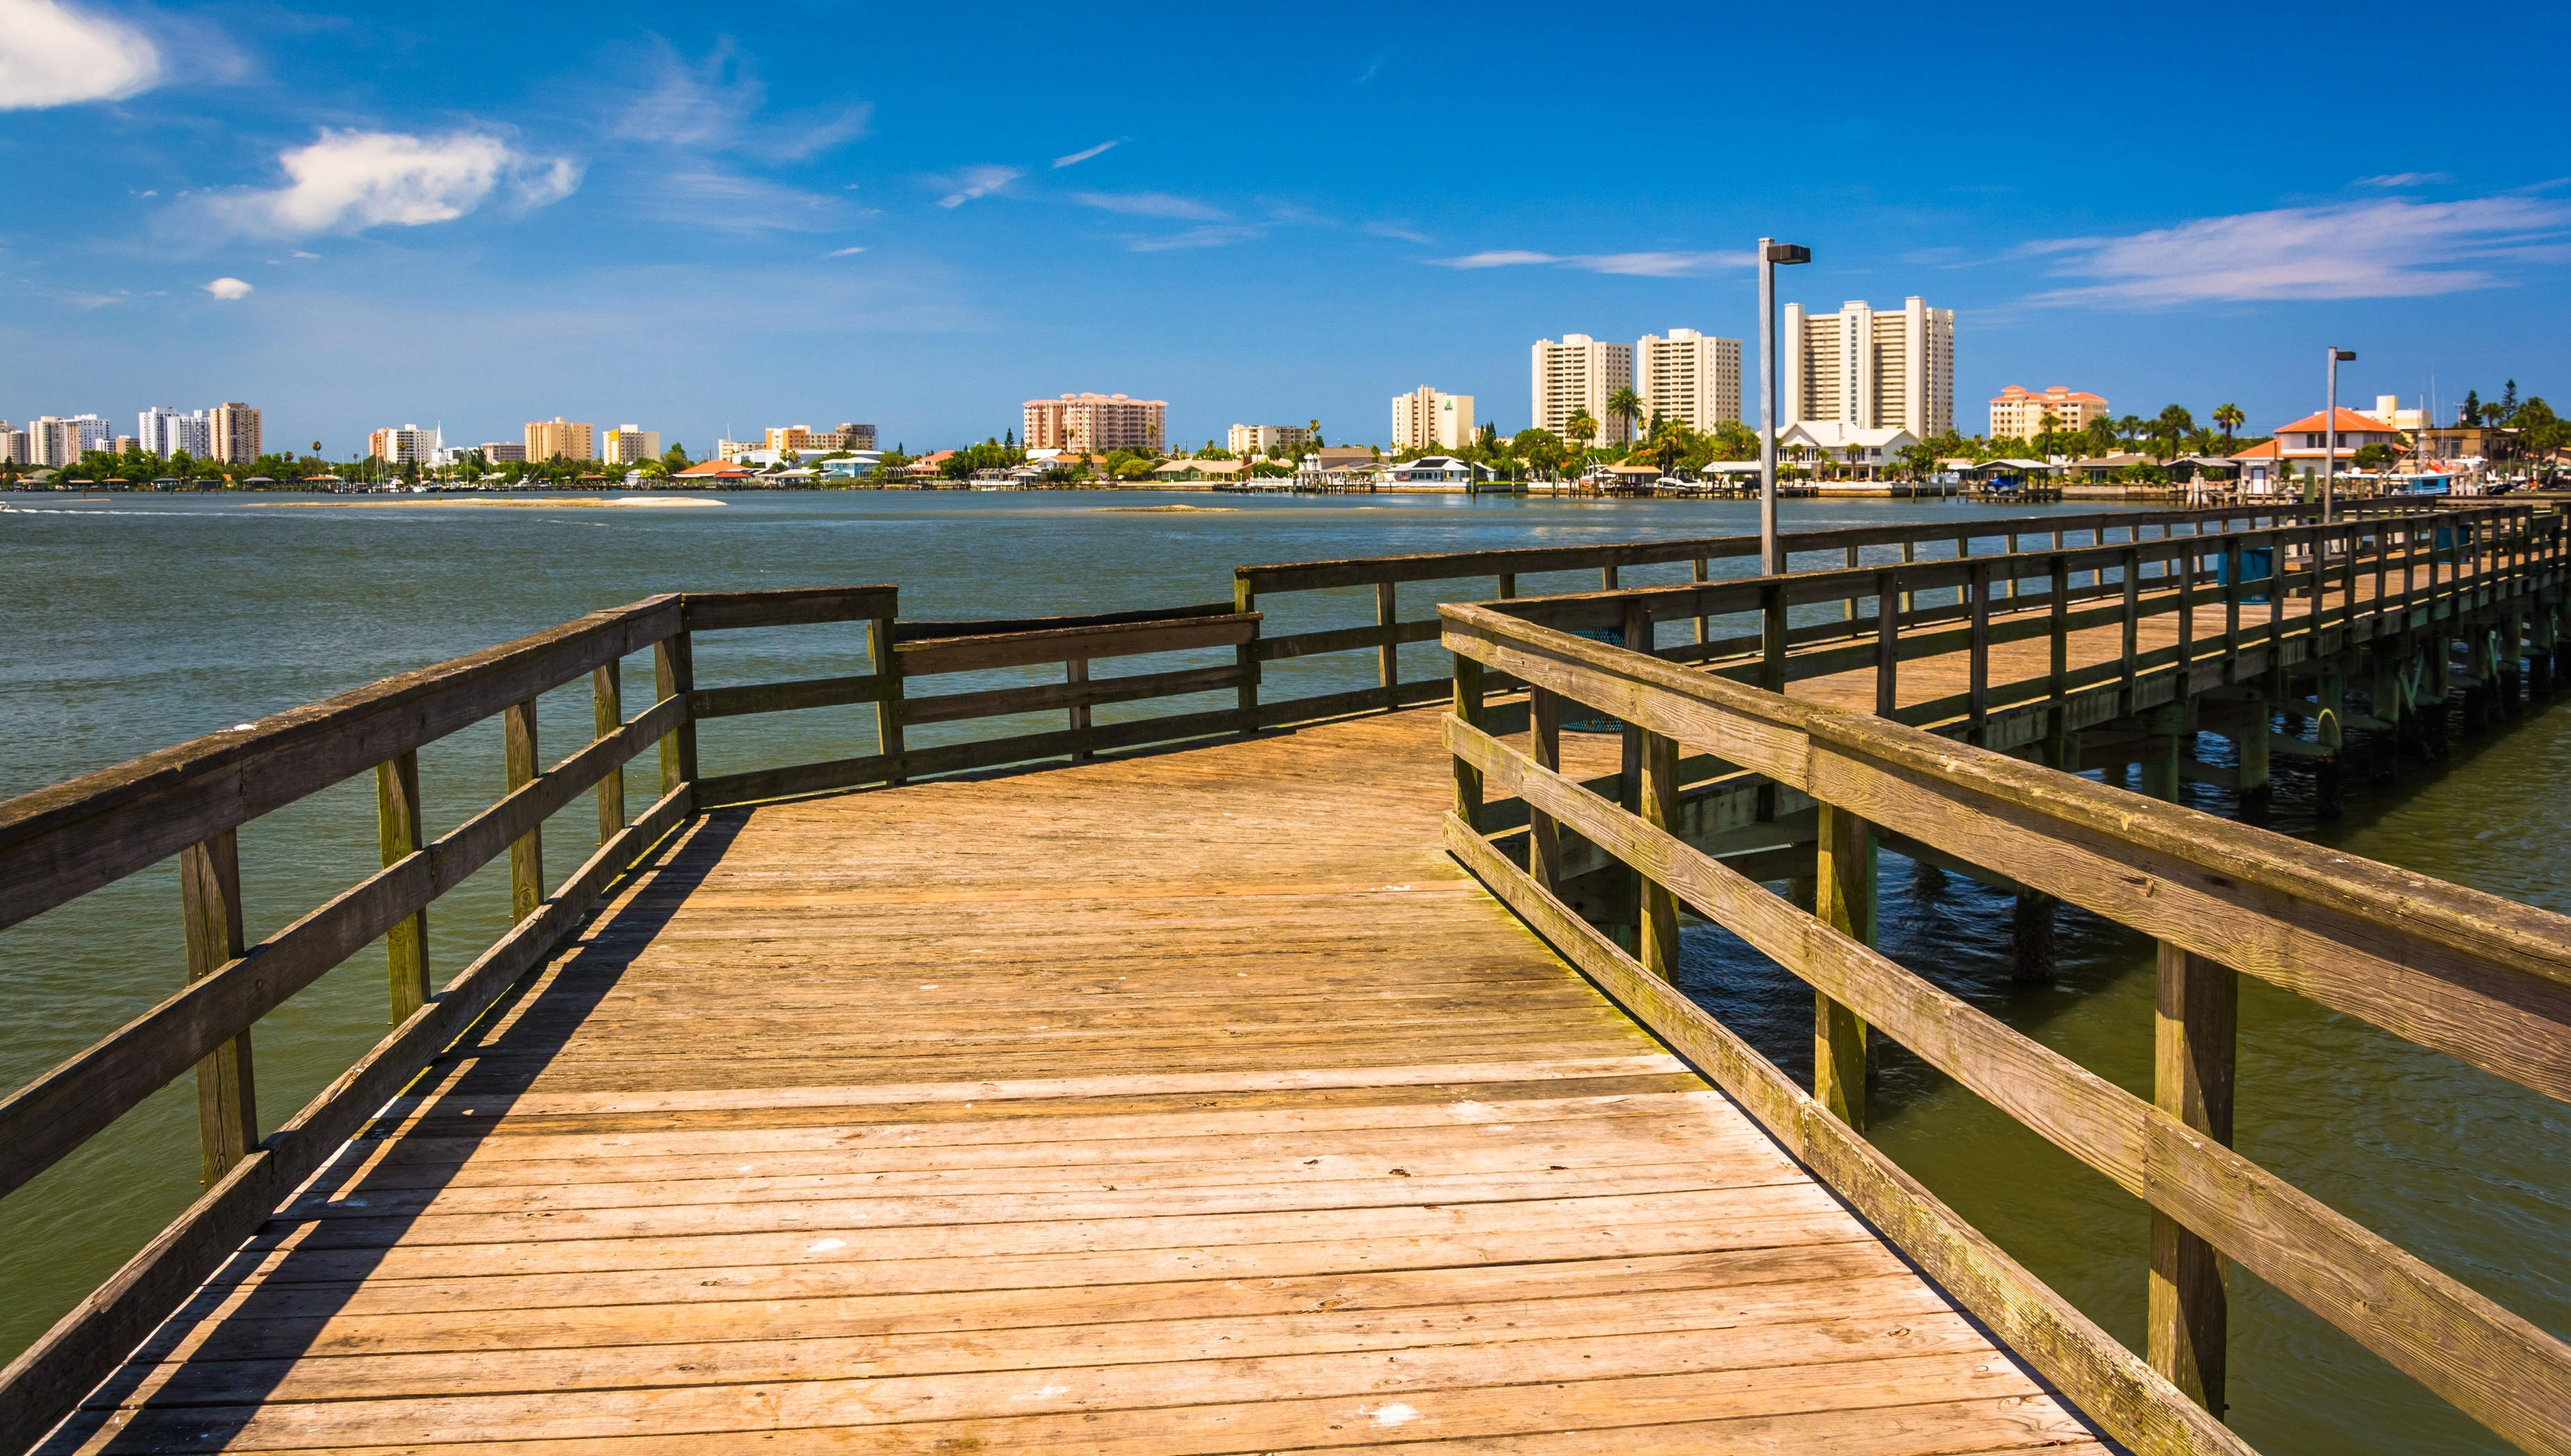 Port Orange, Florida, United States of America